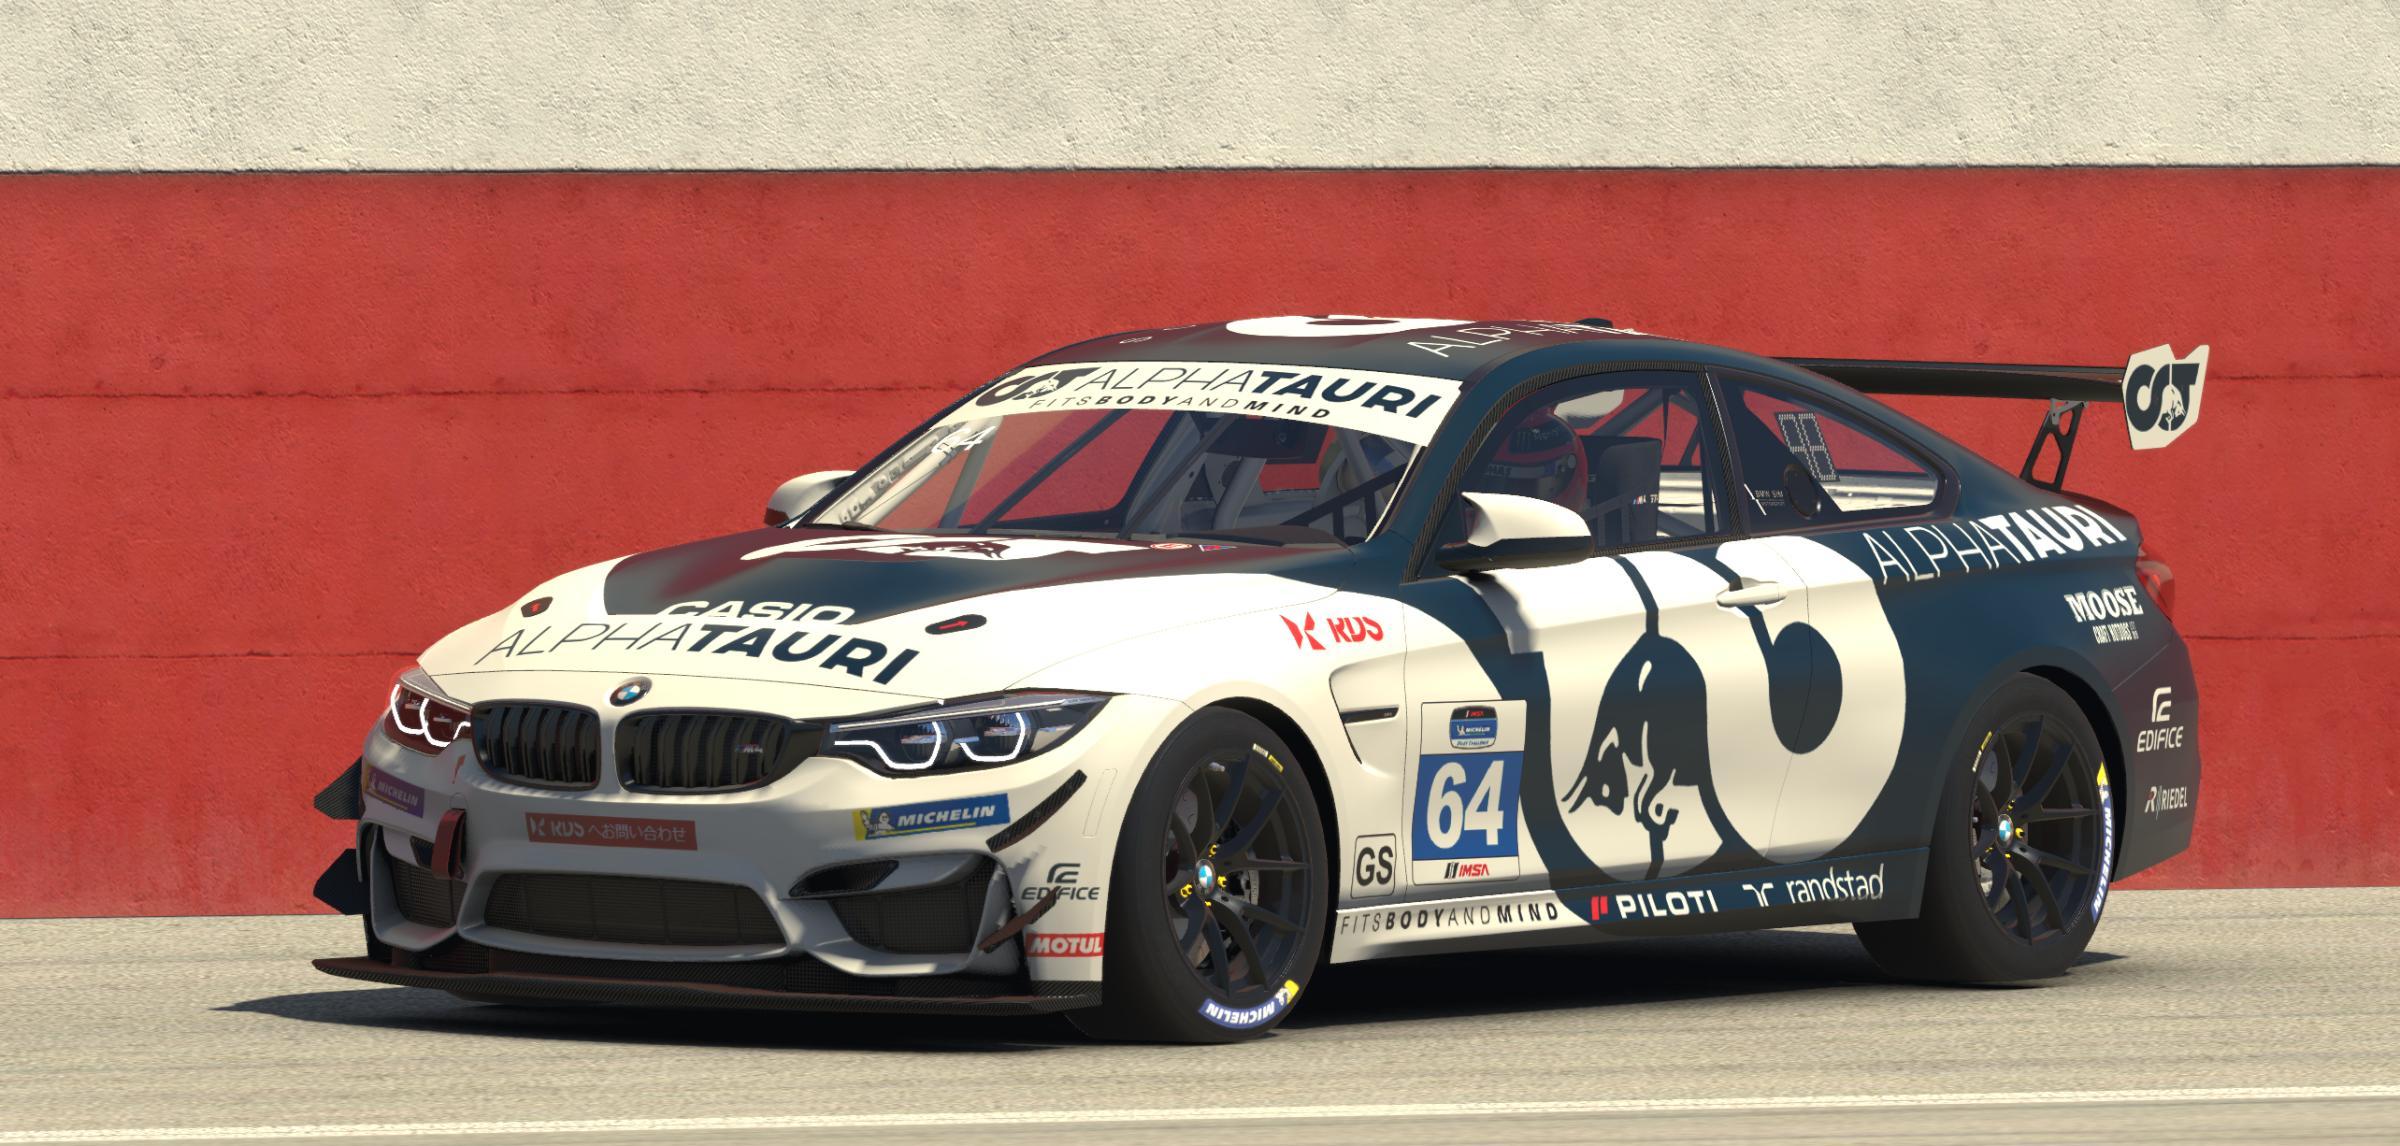 Preview of Alpha Tauri BMW M4 GT4 by Stefan Gawlista